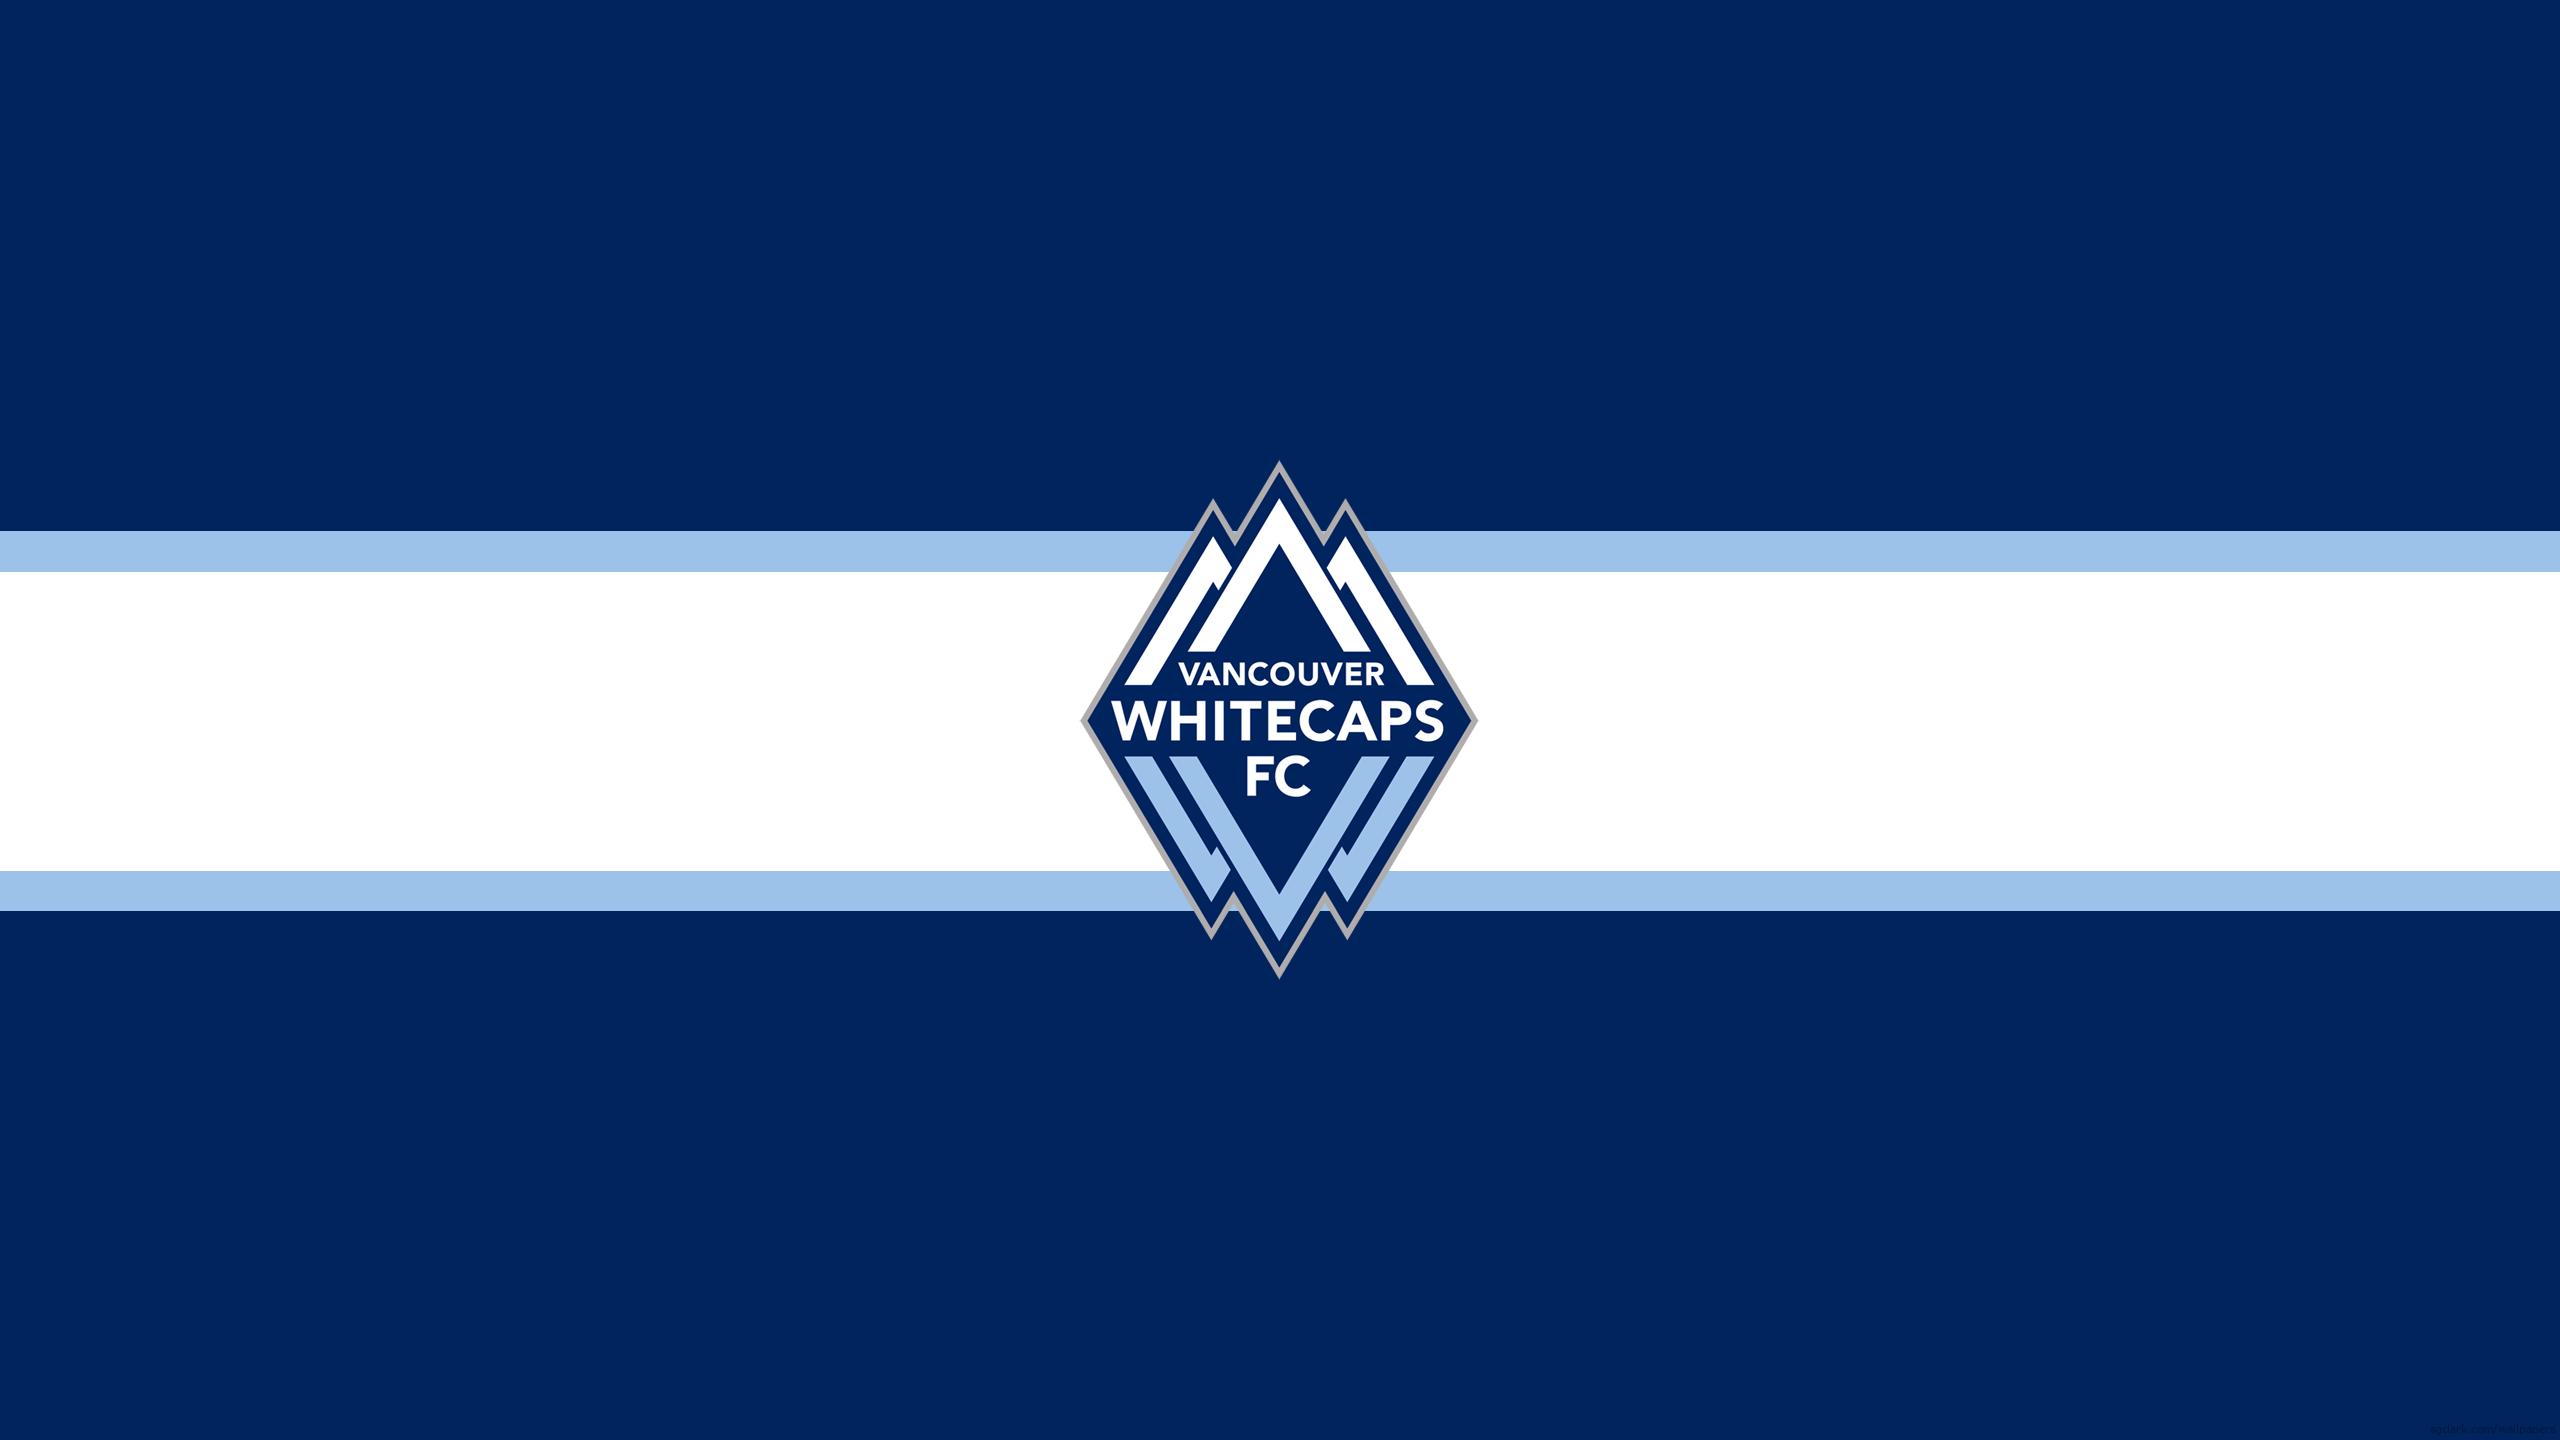 Vancouver Whitecaps (Away)